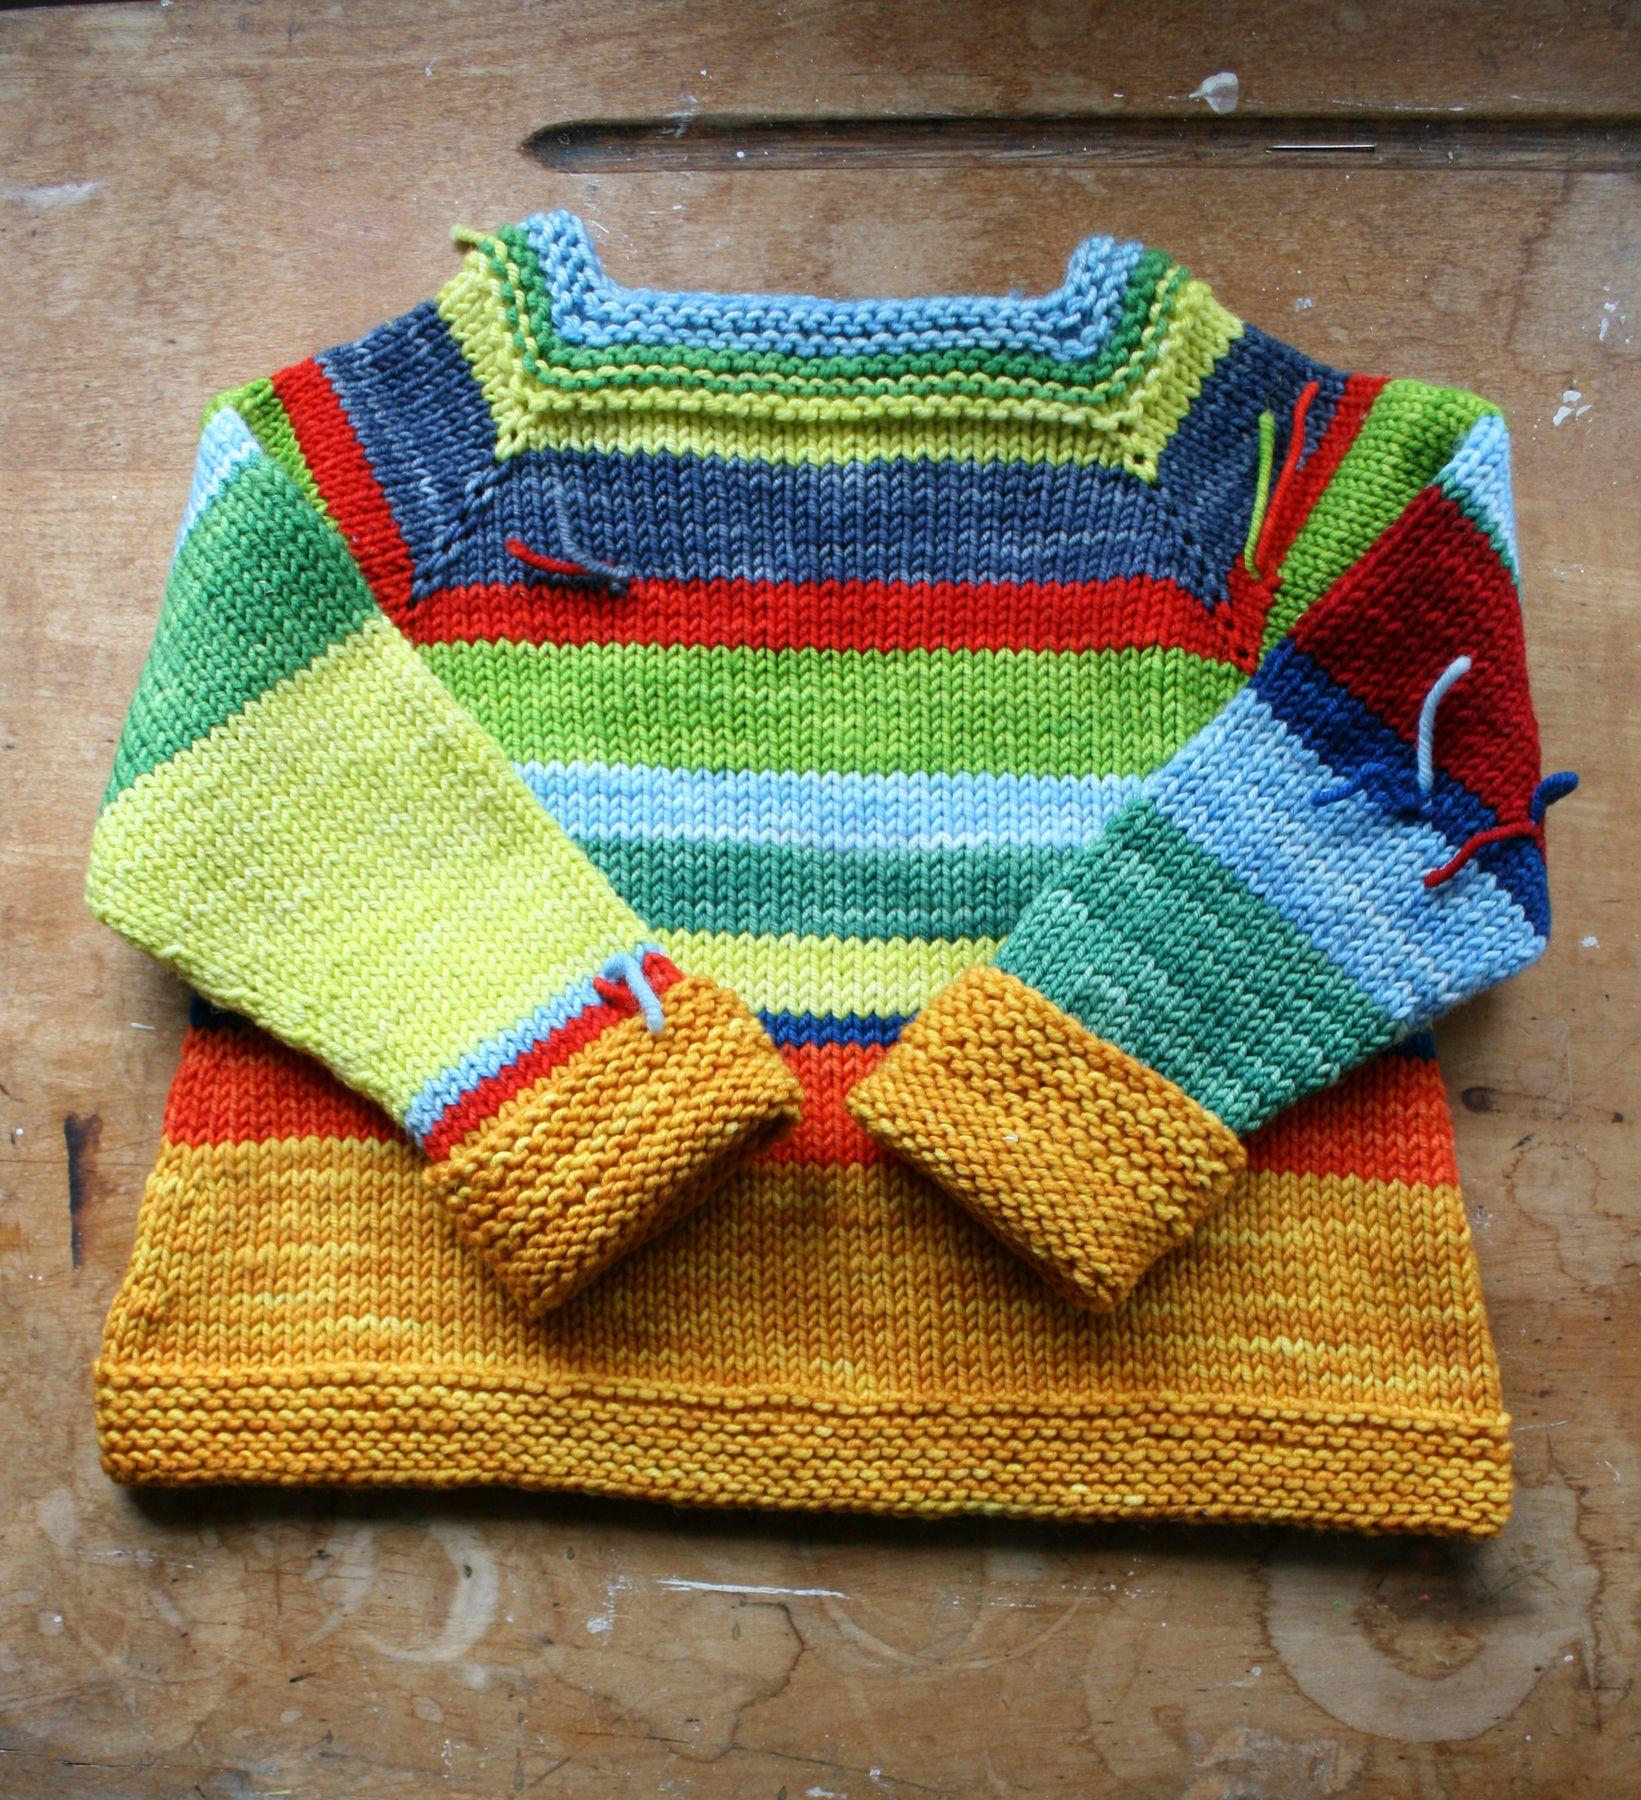 Scrappy sweater mostly improvised ish details on rav httpwww knitting ideas bankloansurffo Images